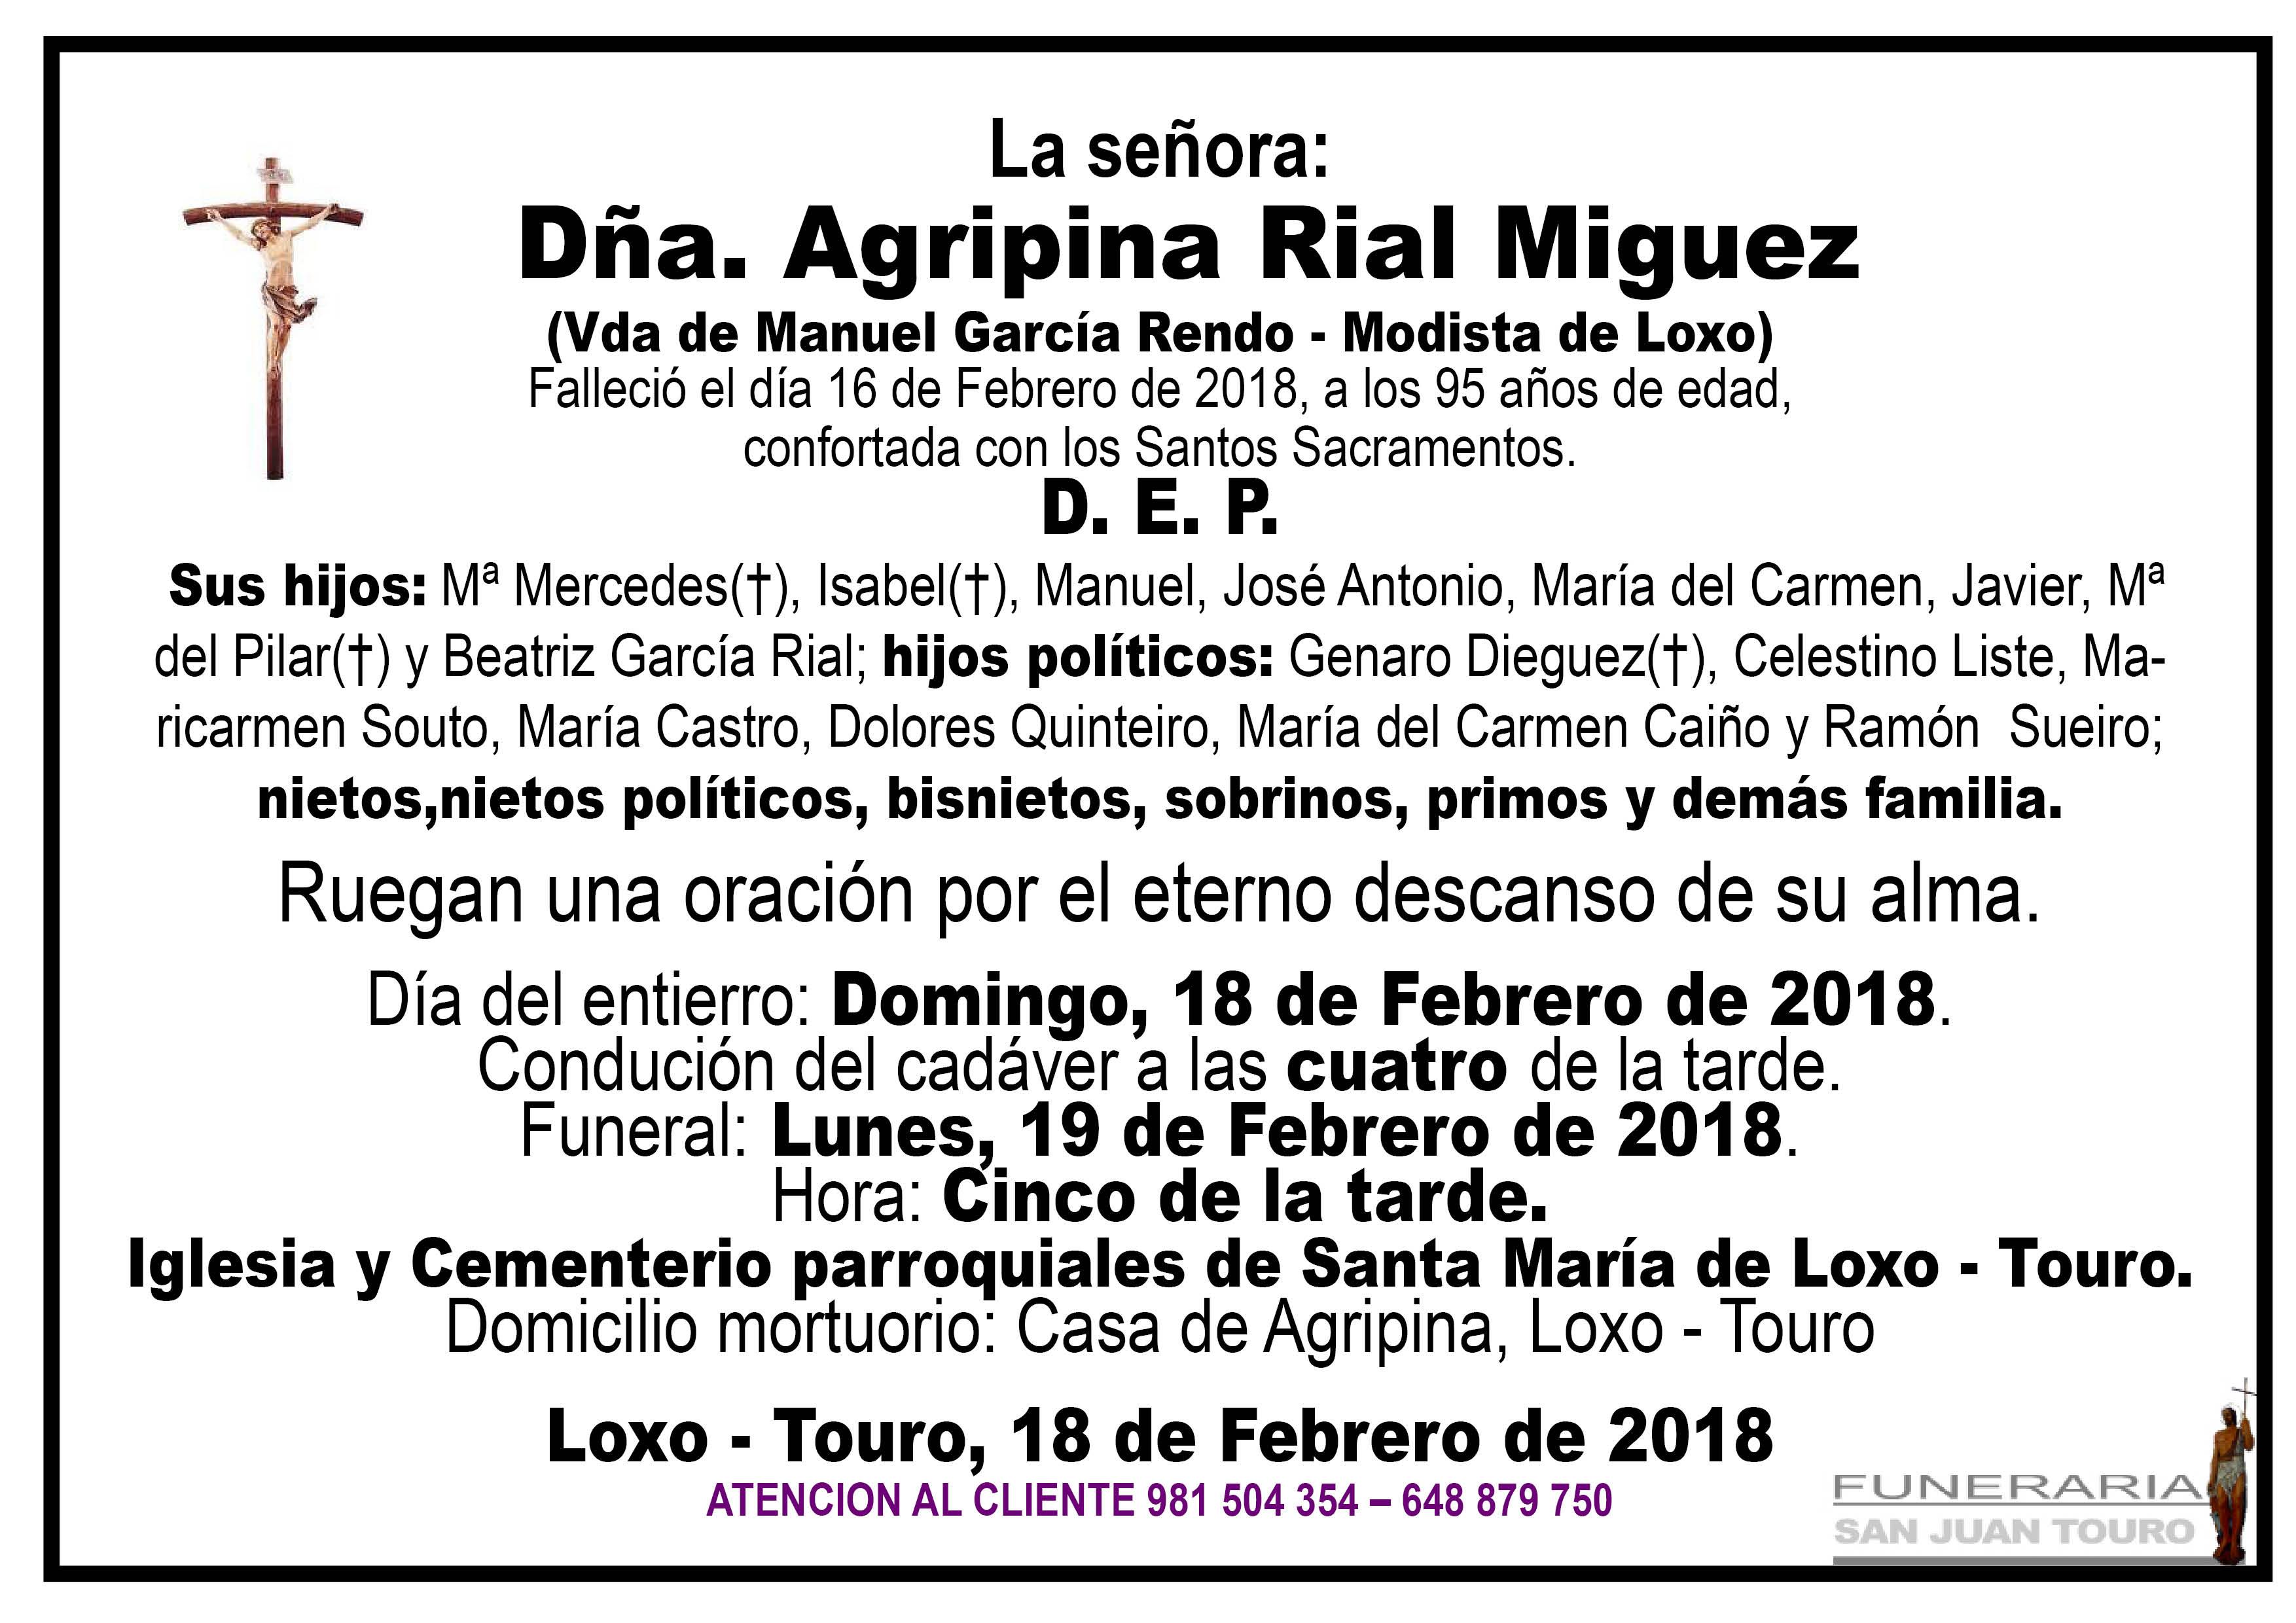 Esquela de SEPELIO DE DOÑA AGRIPINA RIAL MIGUEZ